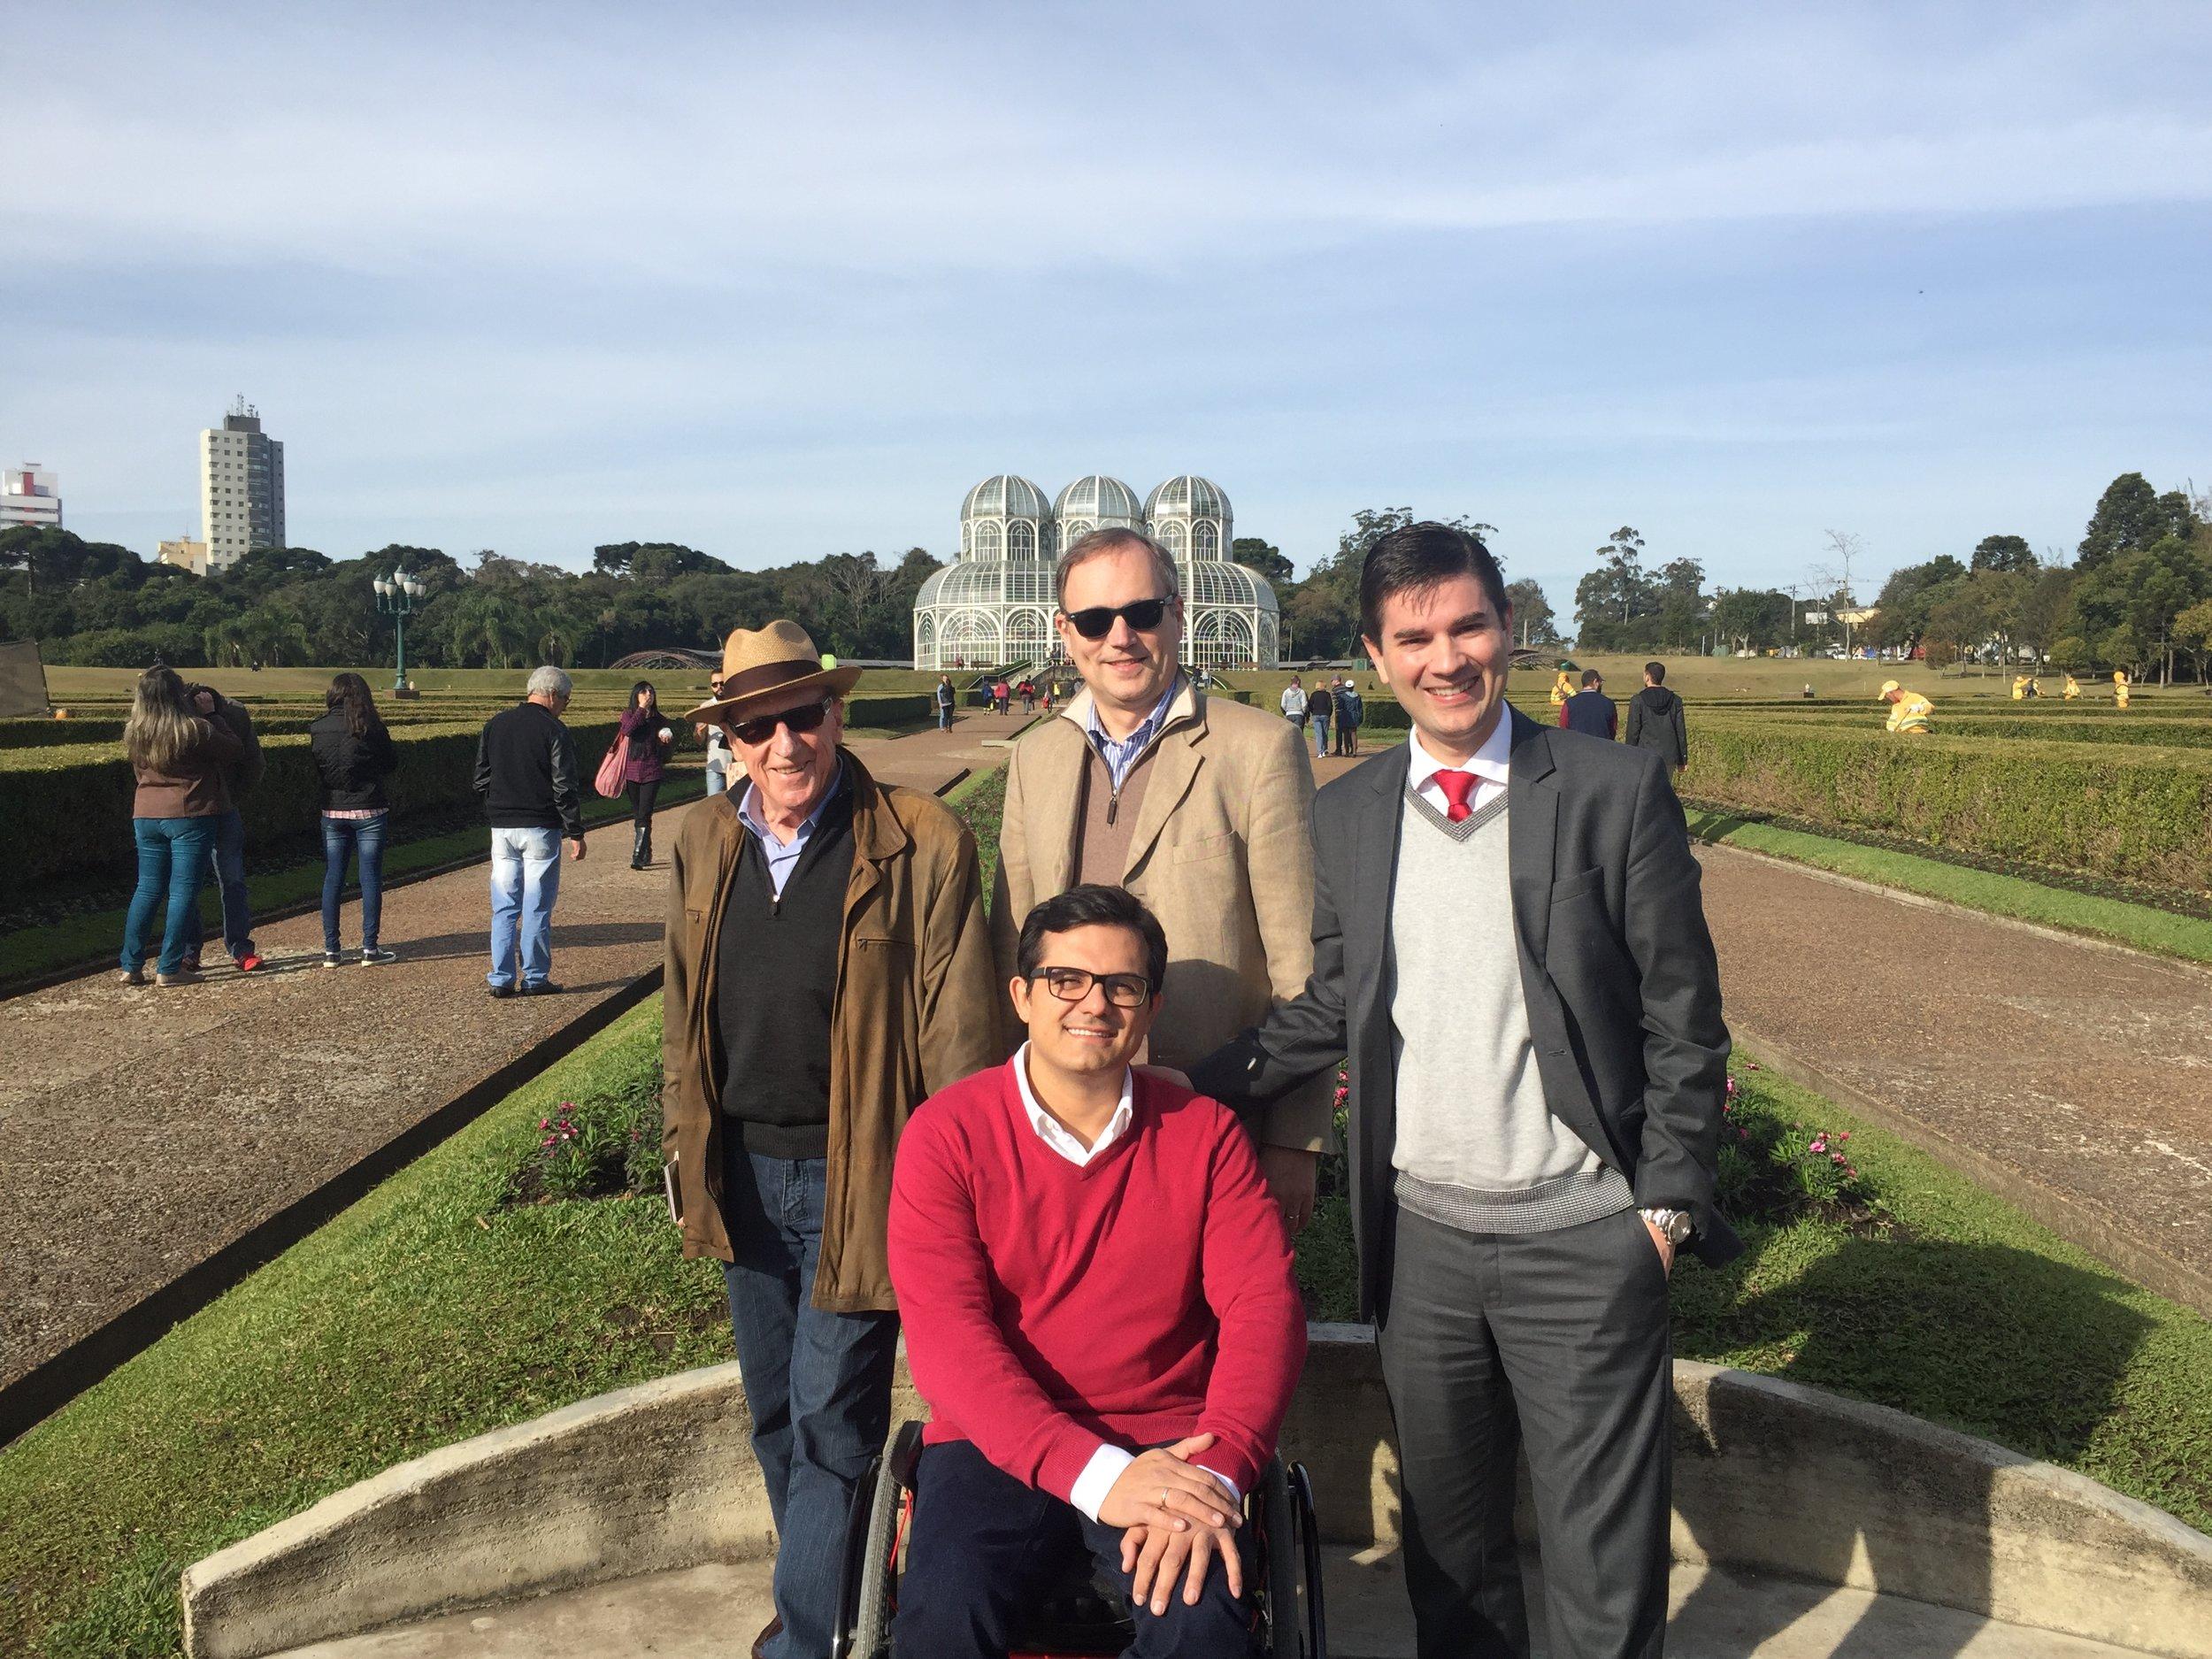 With professors Madersbacher, Chatier Kastler and Averveck. South Brazilian urology annual meeting. Curitiba 2016